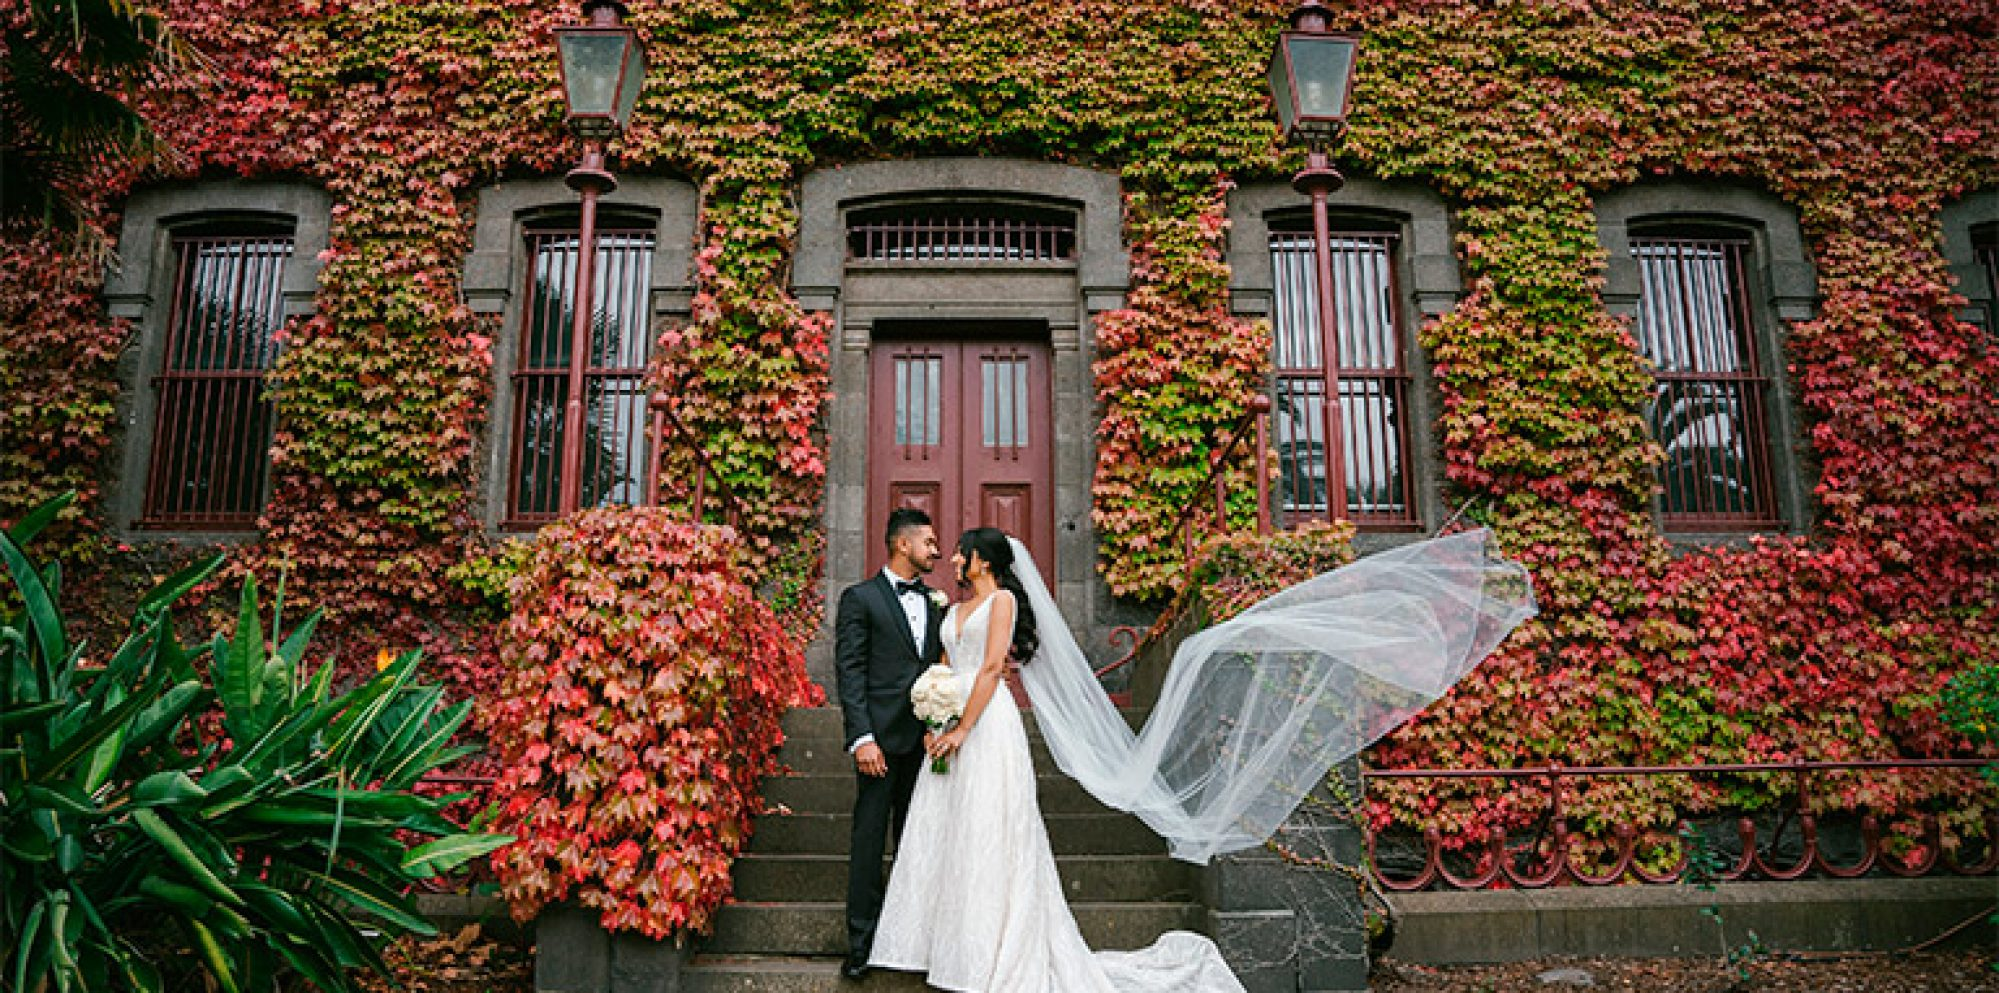 Lakmi & stephan wedding photography @ merrimu receptions